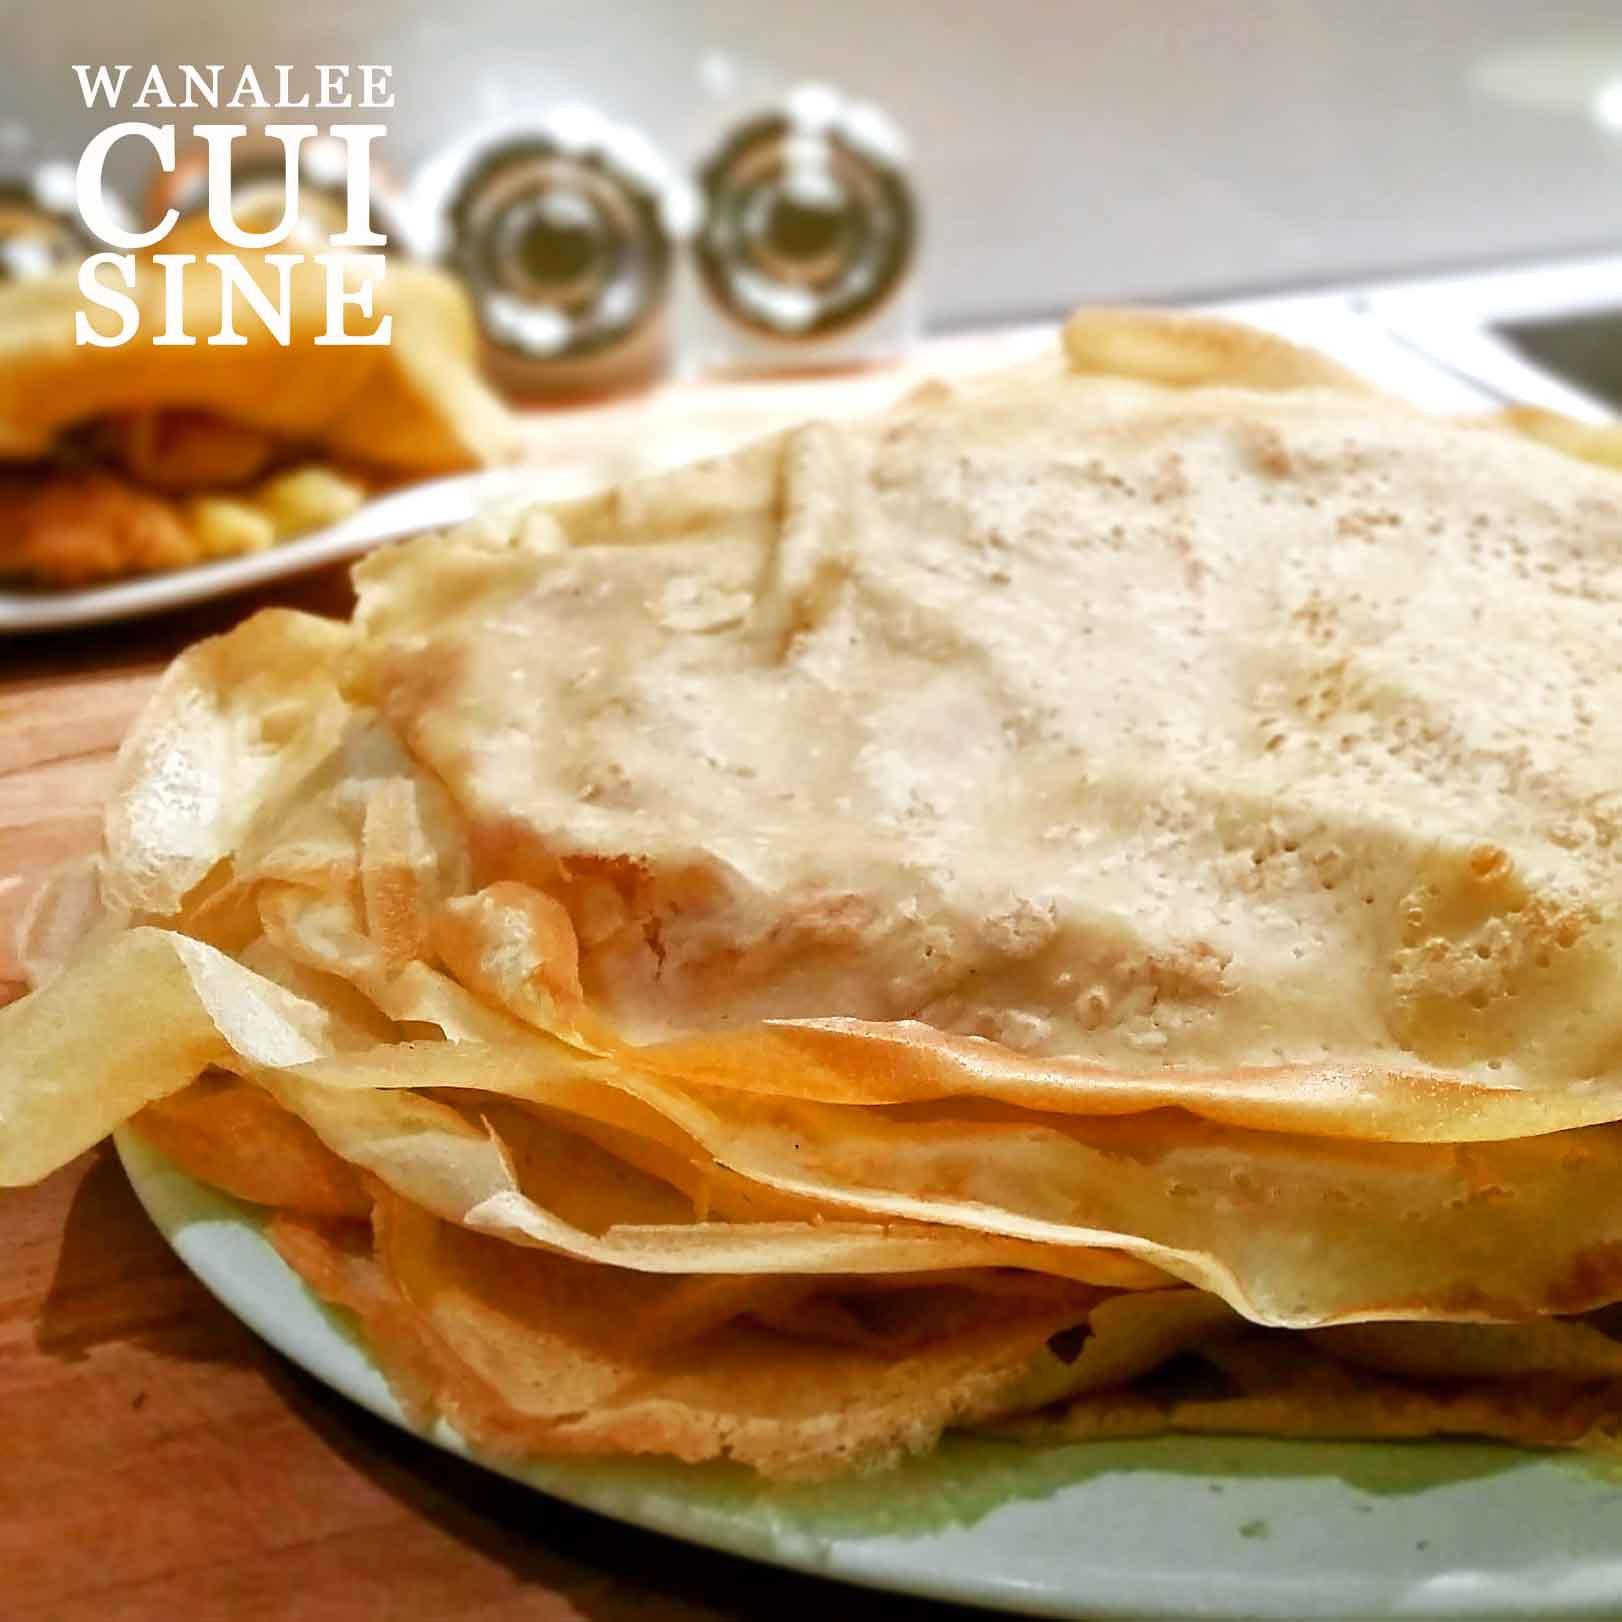 Chandeleur wanalee cuisine - Recette pate a crepe bretonne ...